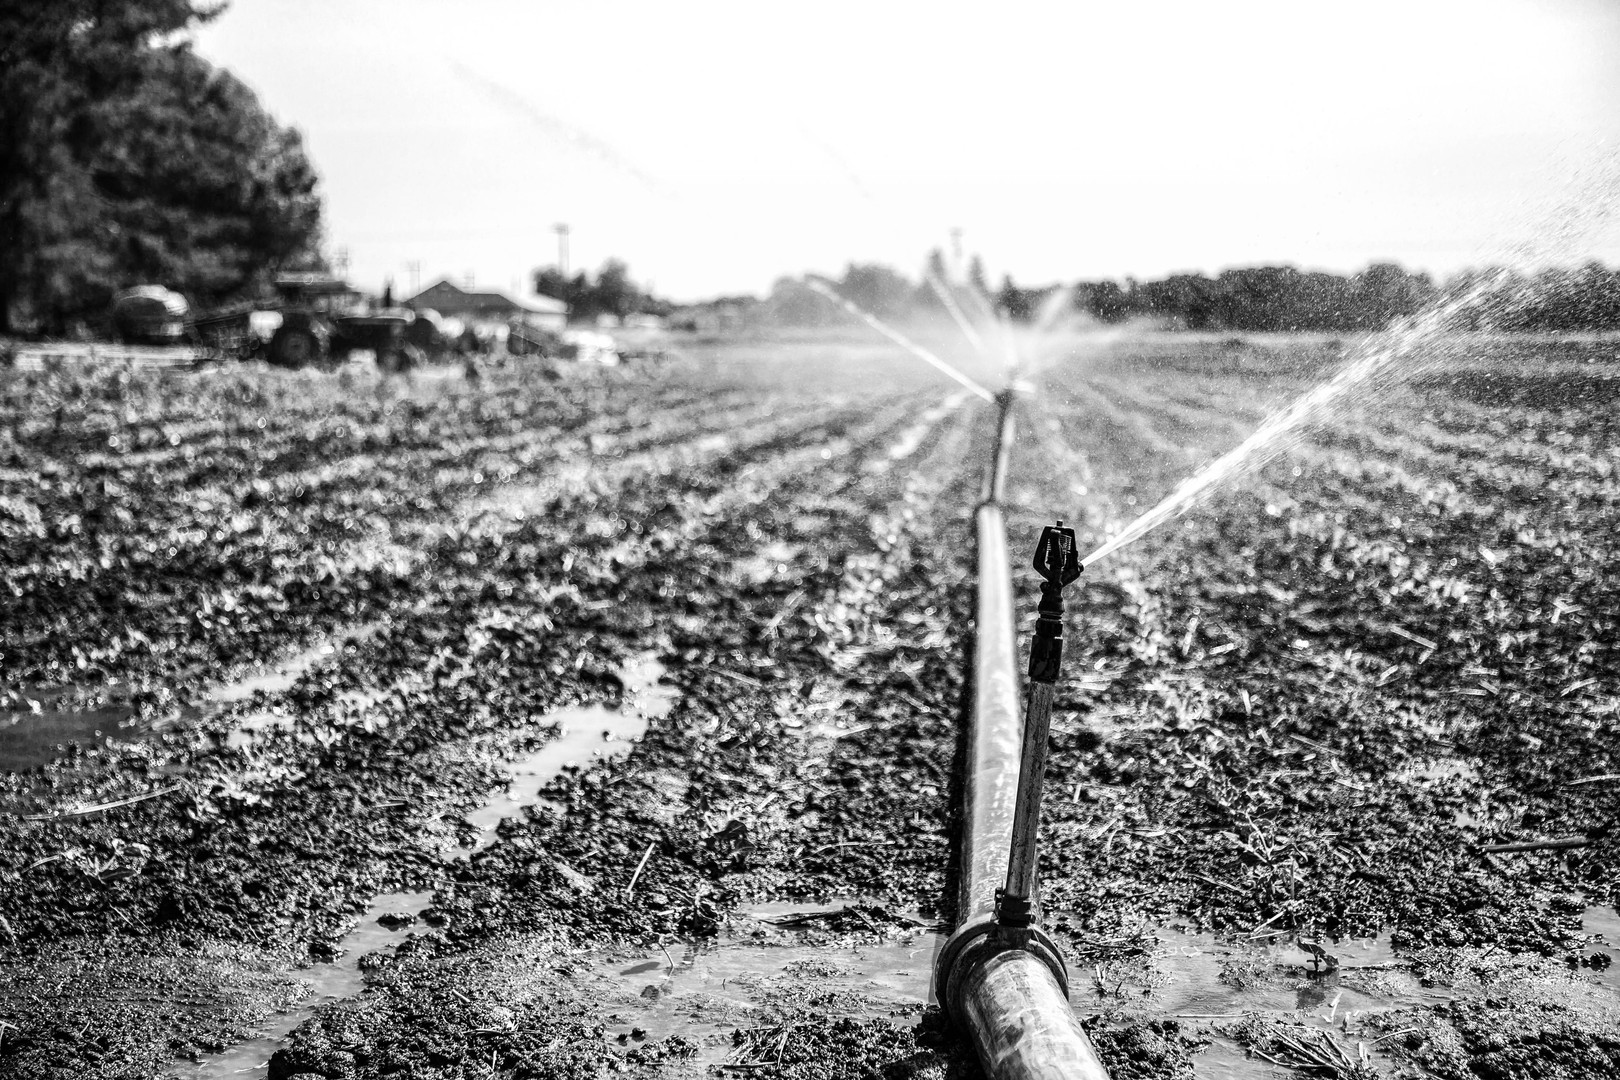 Morning Irrigation